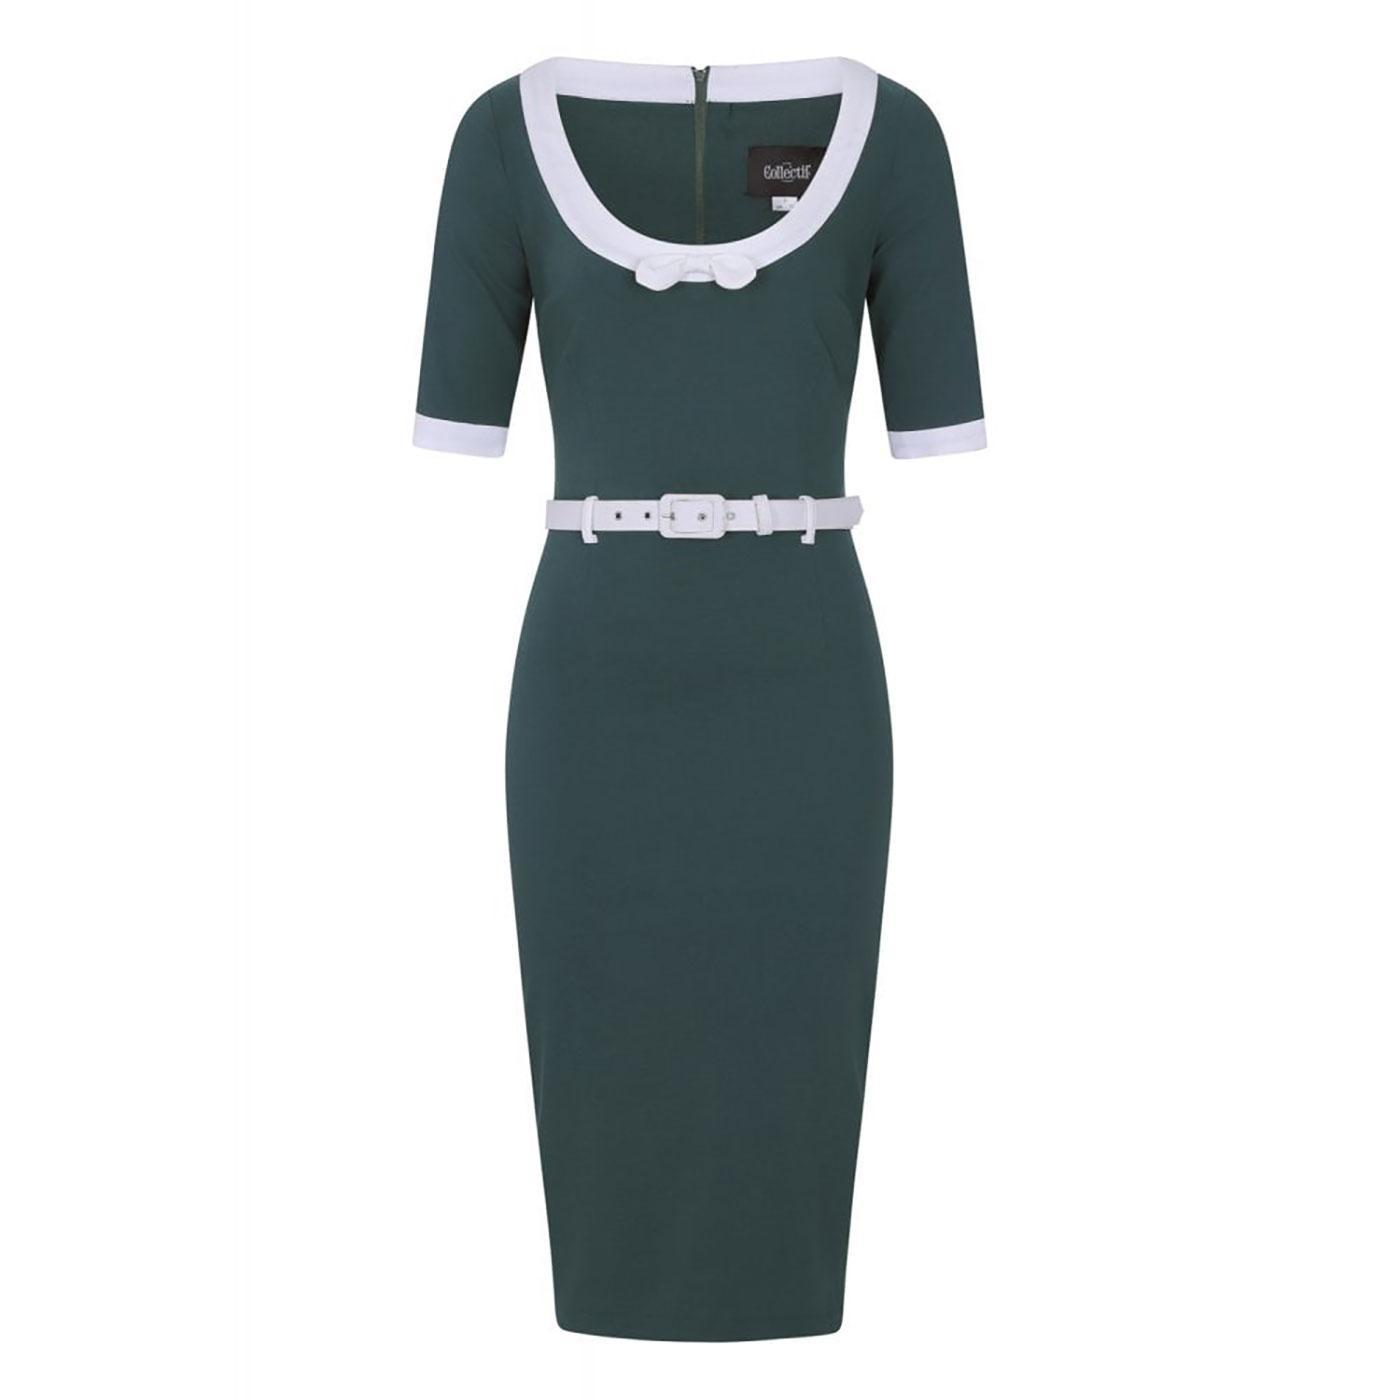 Freya COLLECTIF Vintage Wiggle Dress - Teal